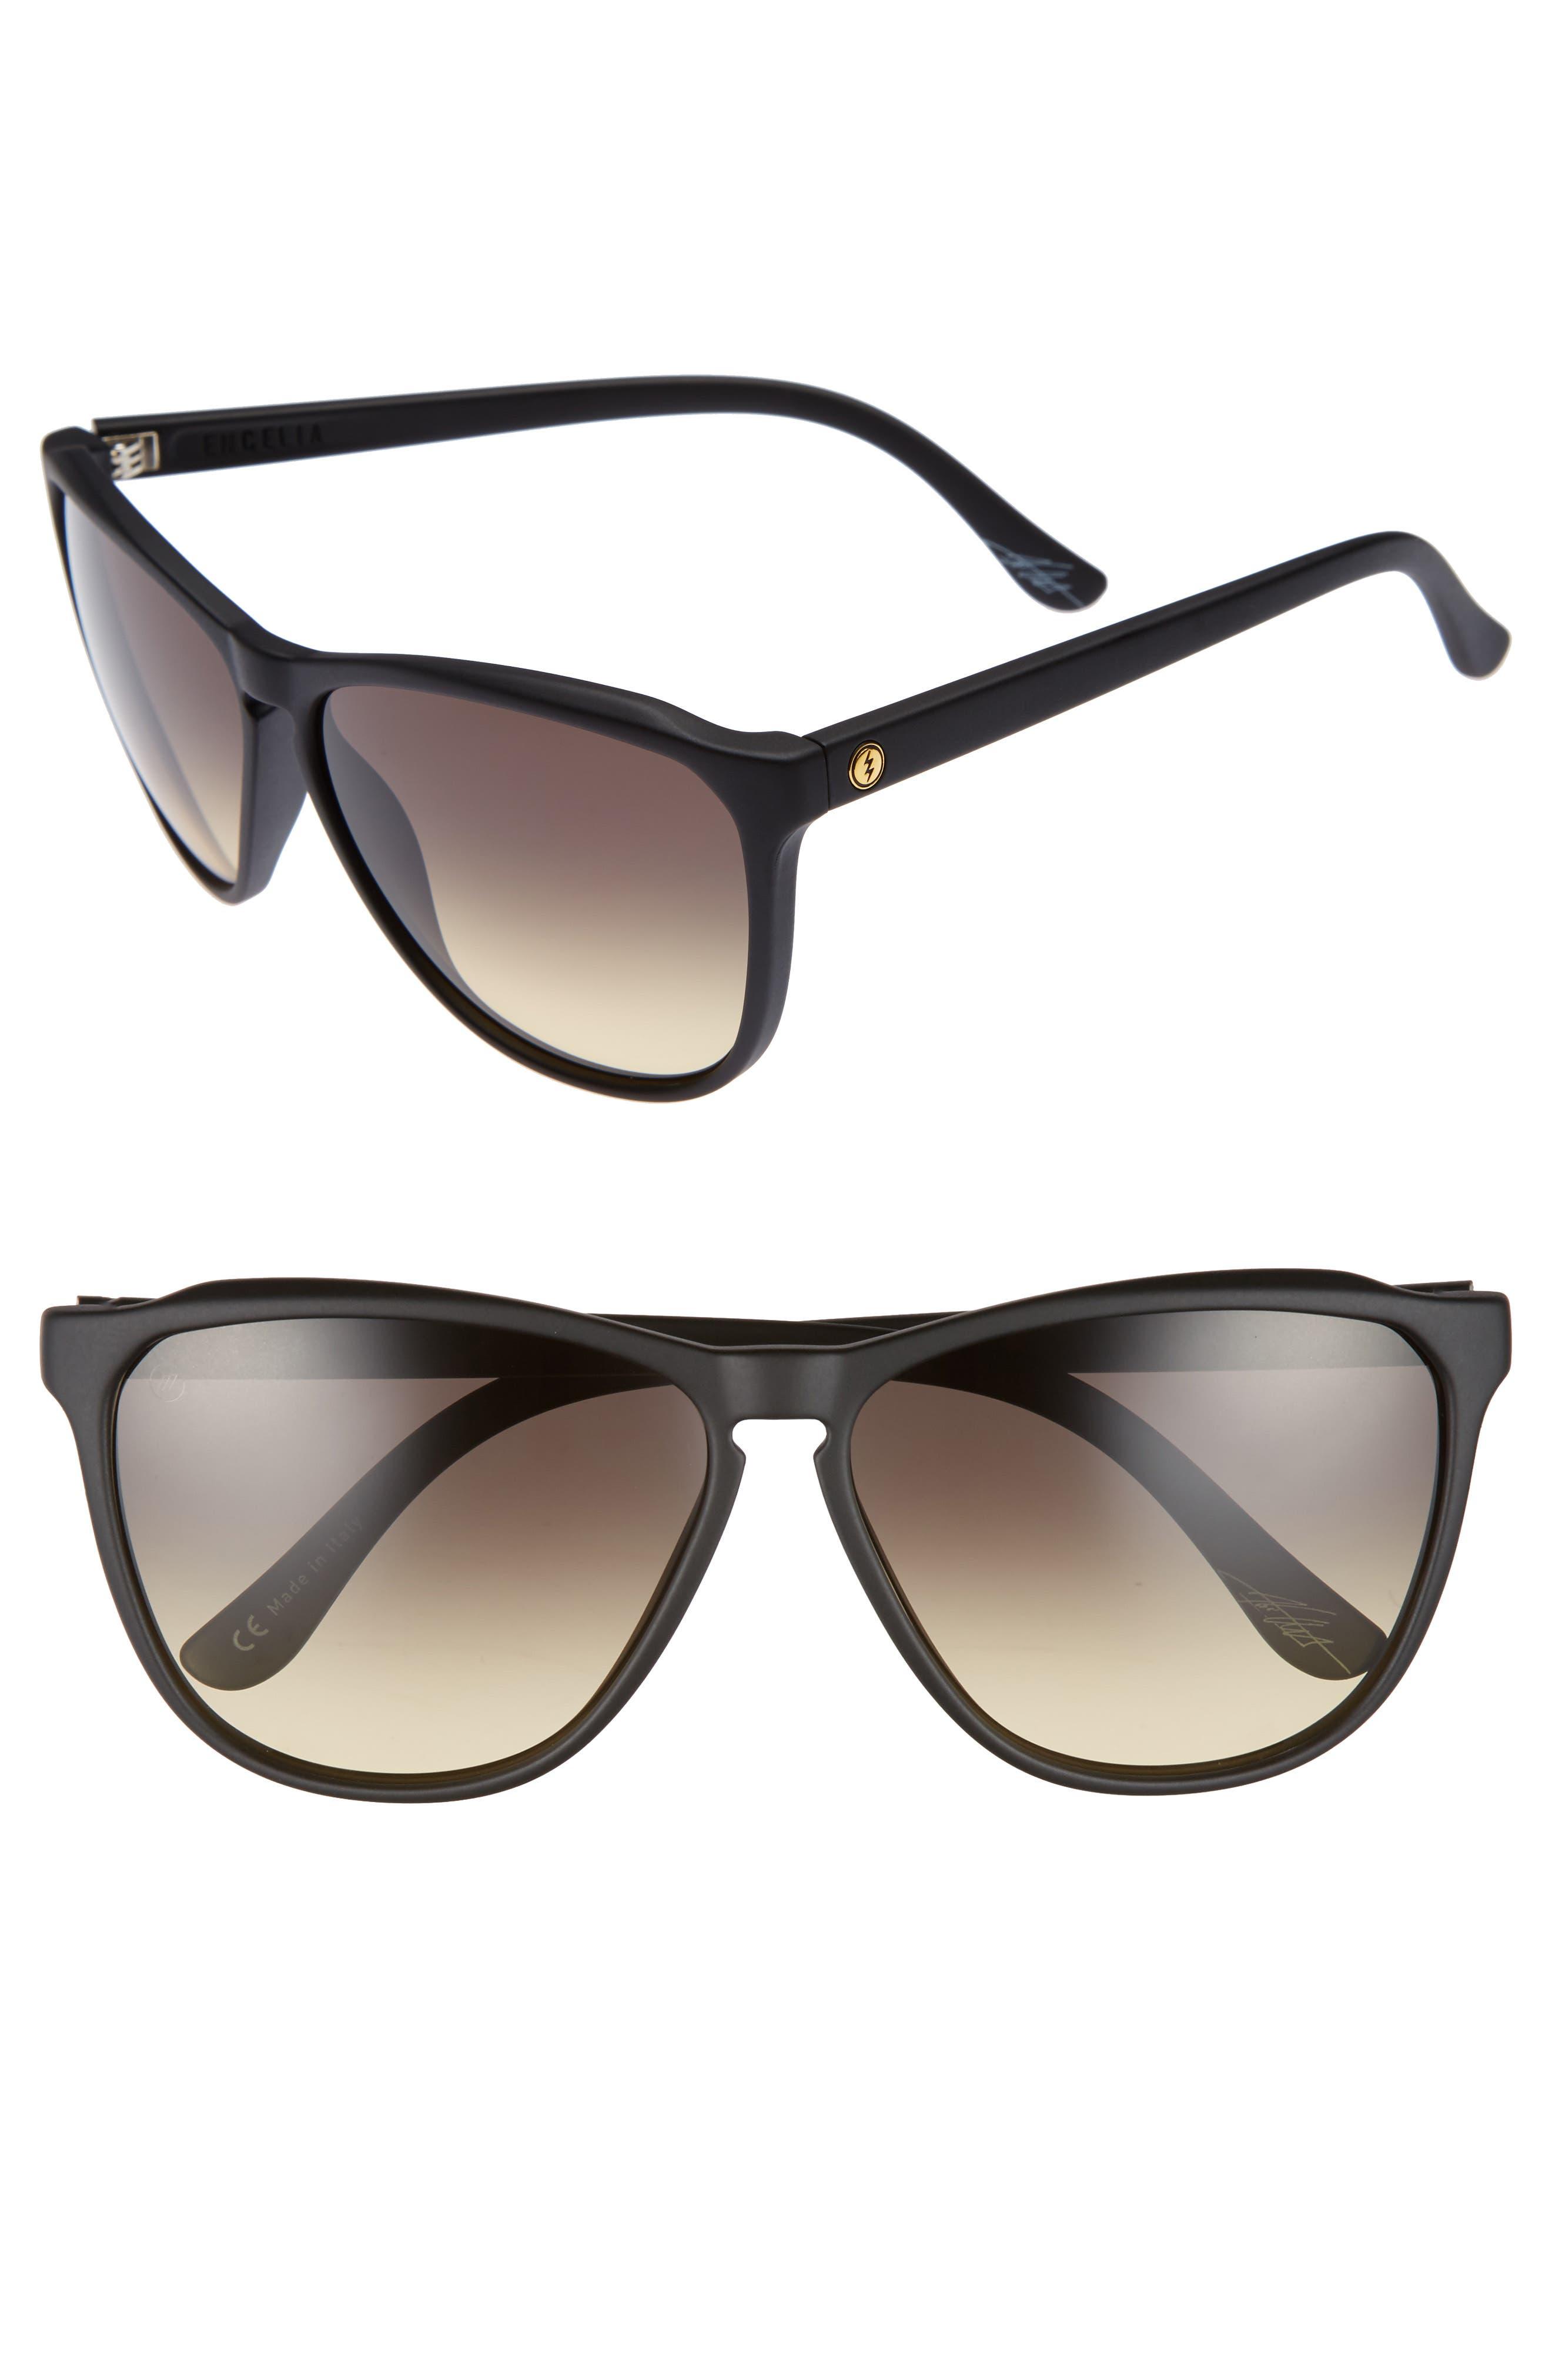 Alternate Image 1 Selected - ELECTRIC 'Encelia' 66mm Retro Sunglasses